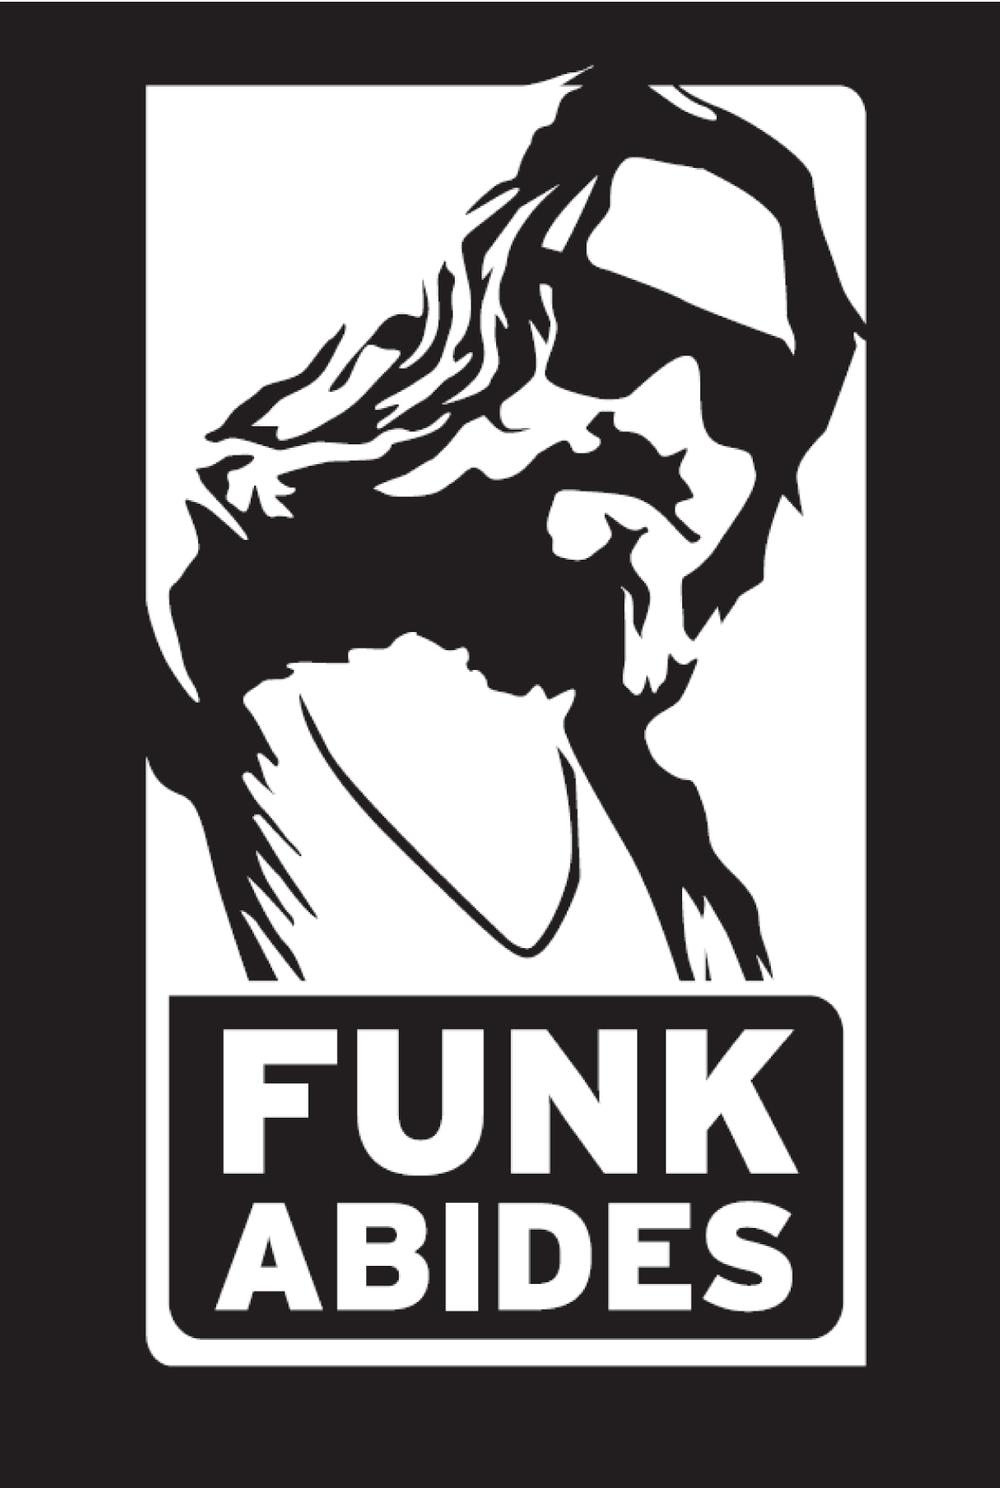 Funk-Abides-Logo_2.png